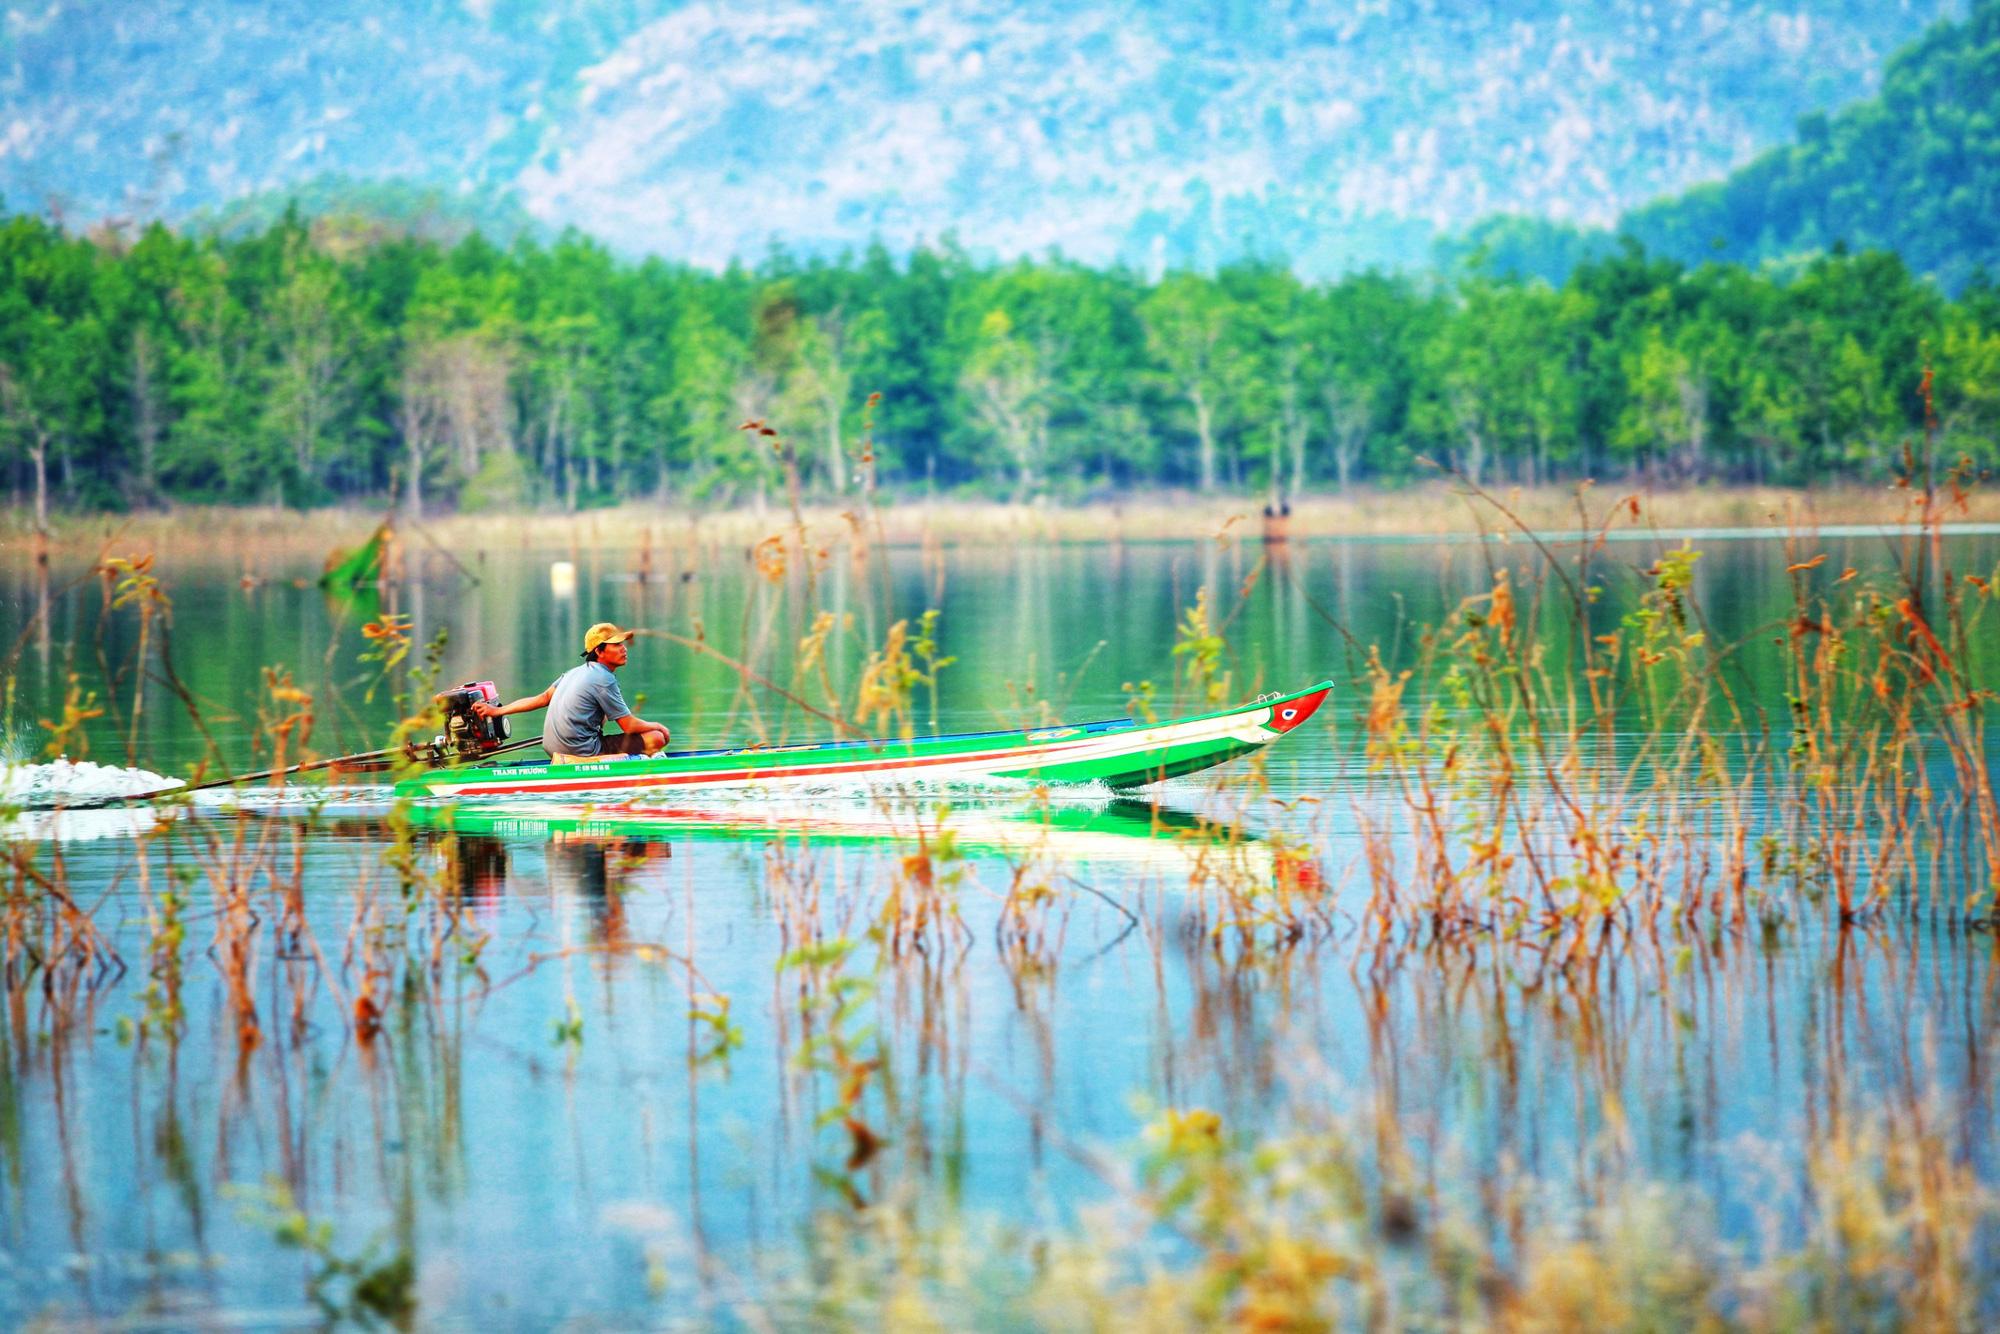 A person drives a canoe across Se San lake in Kon Tum Province, Vietnam. Photo: Chieu Ly / Tuoi Tre